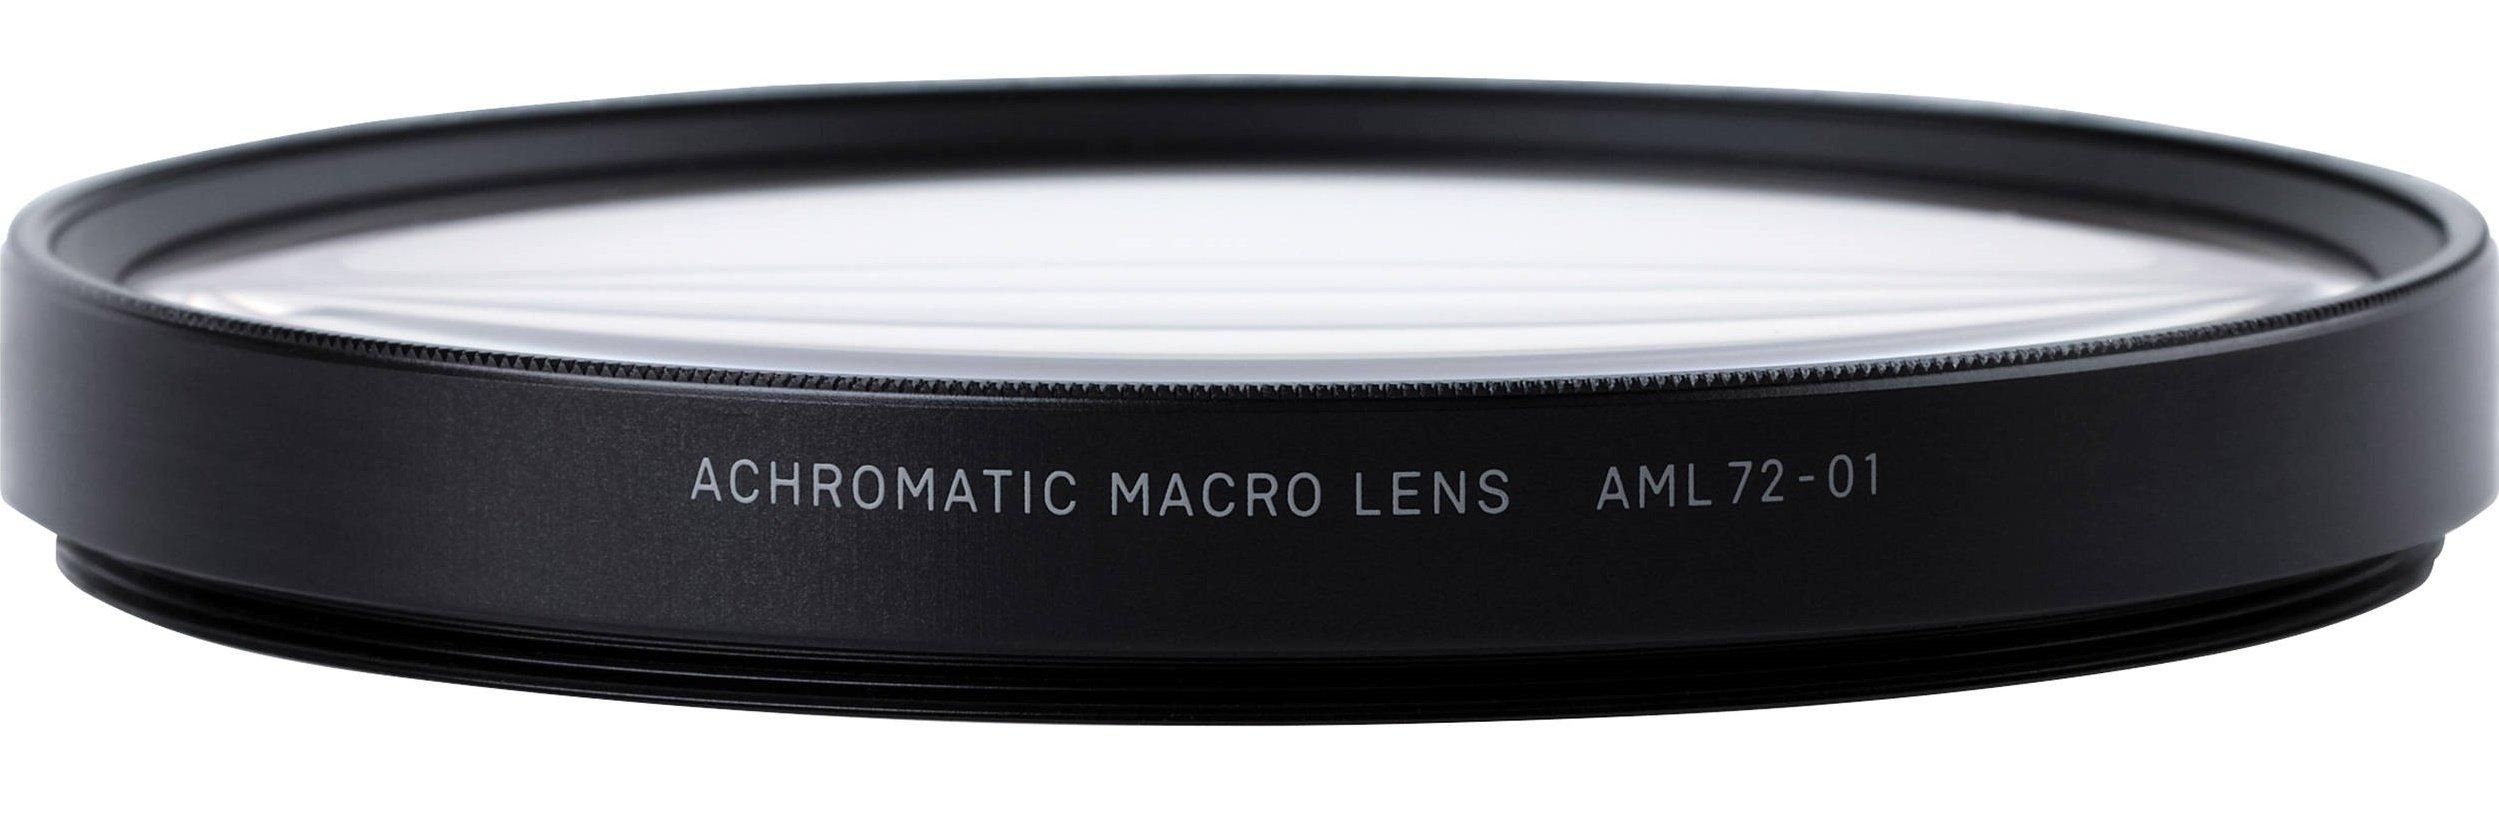 SIGMA close-up AML72-01 pro 18-300 mm